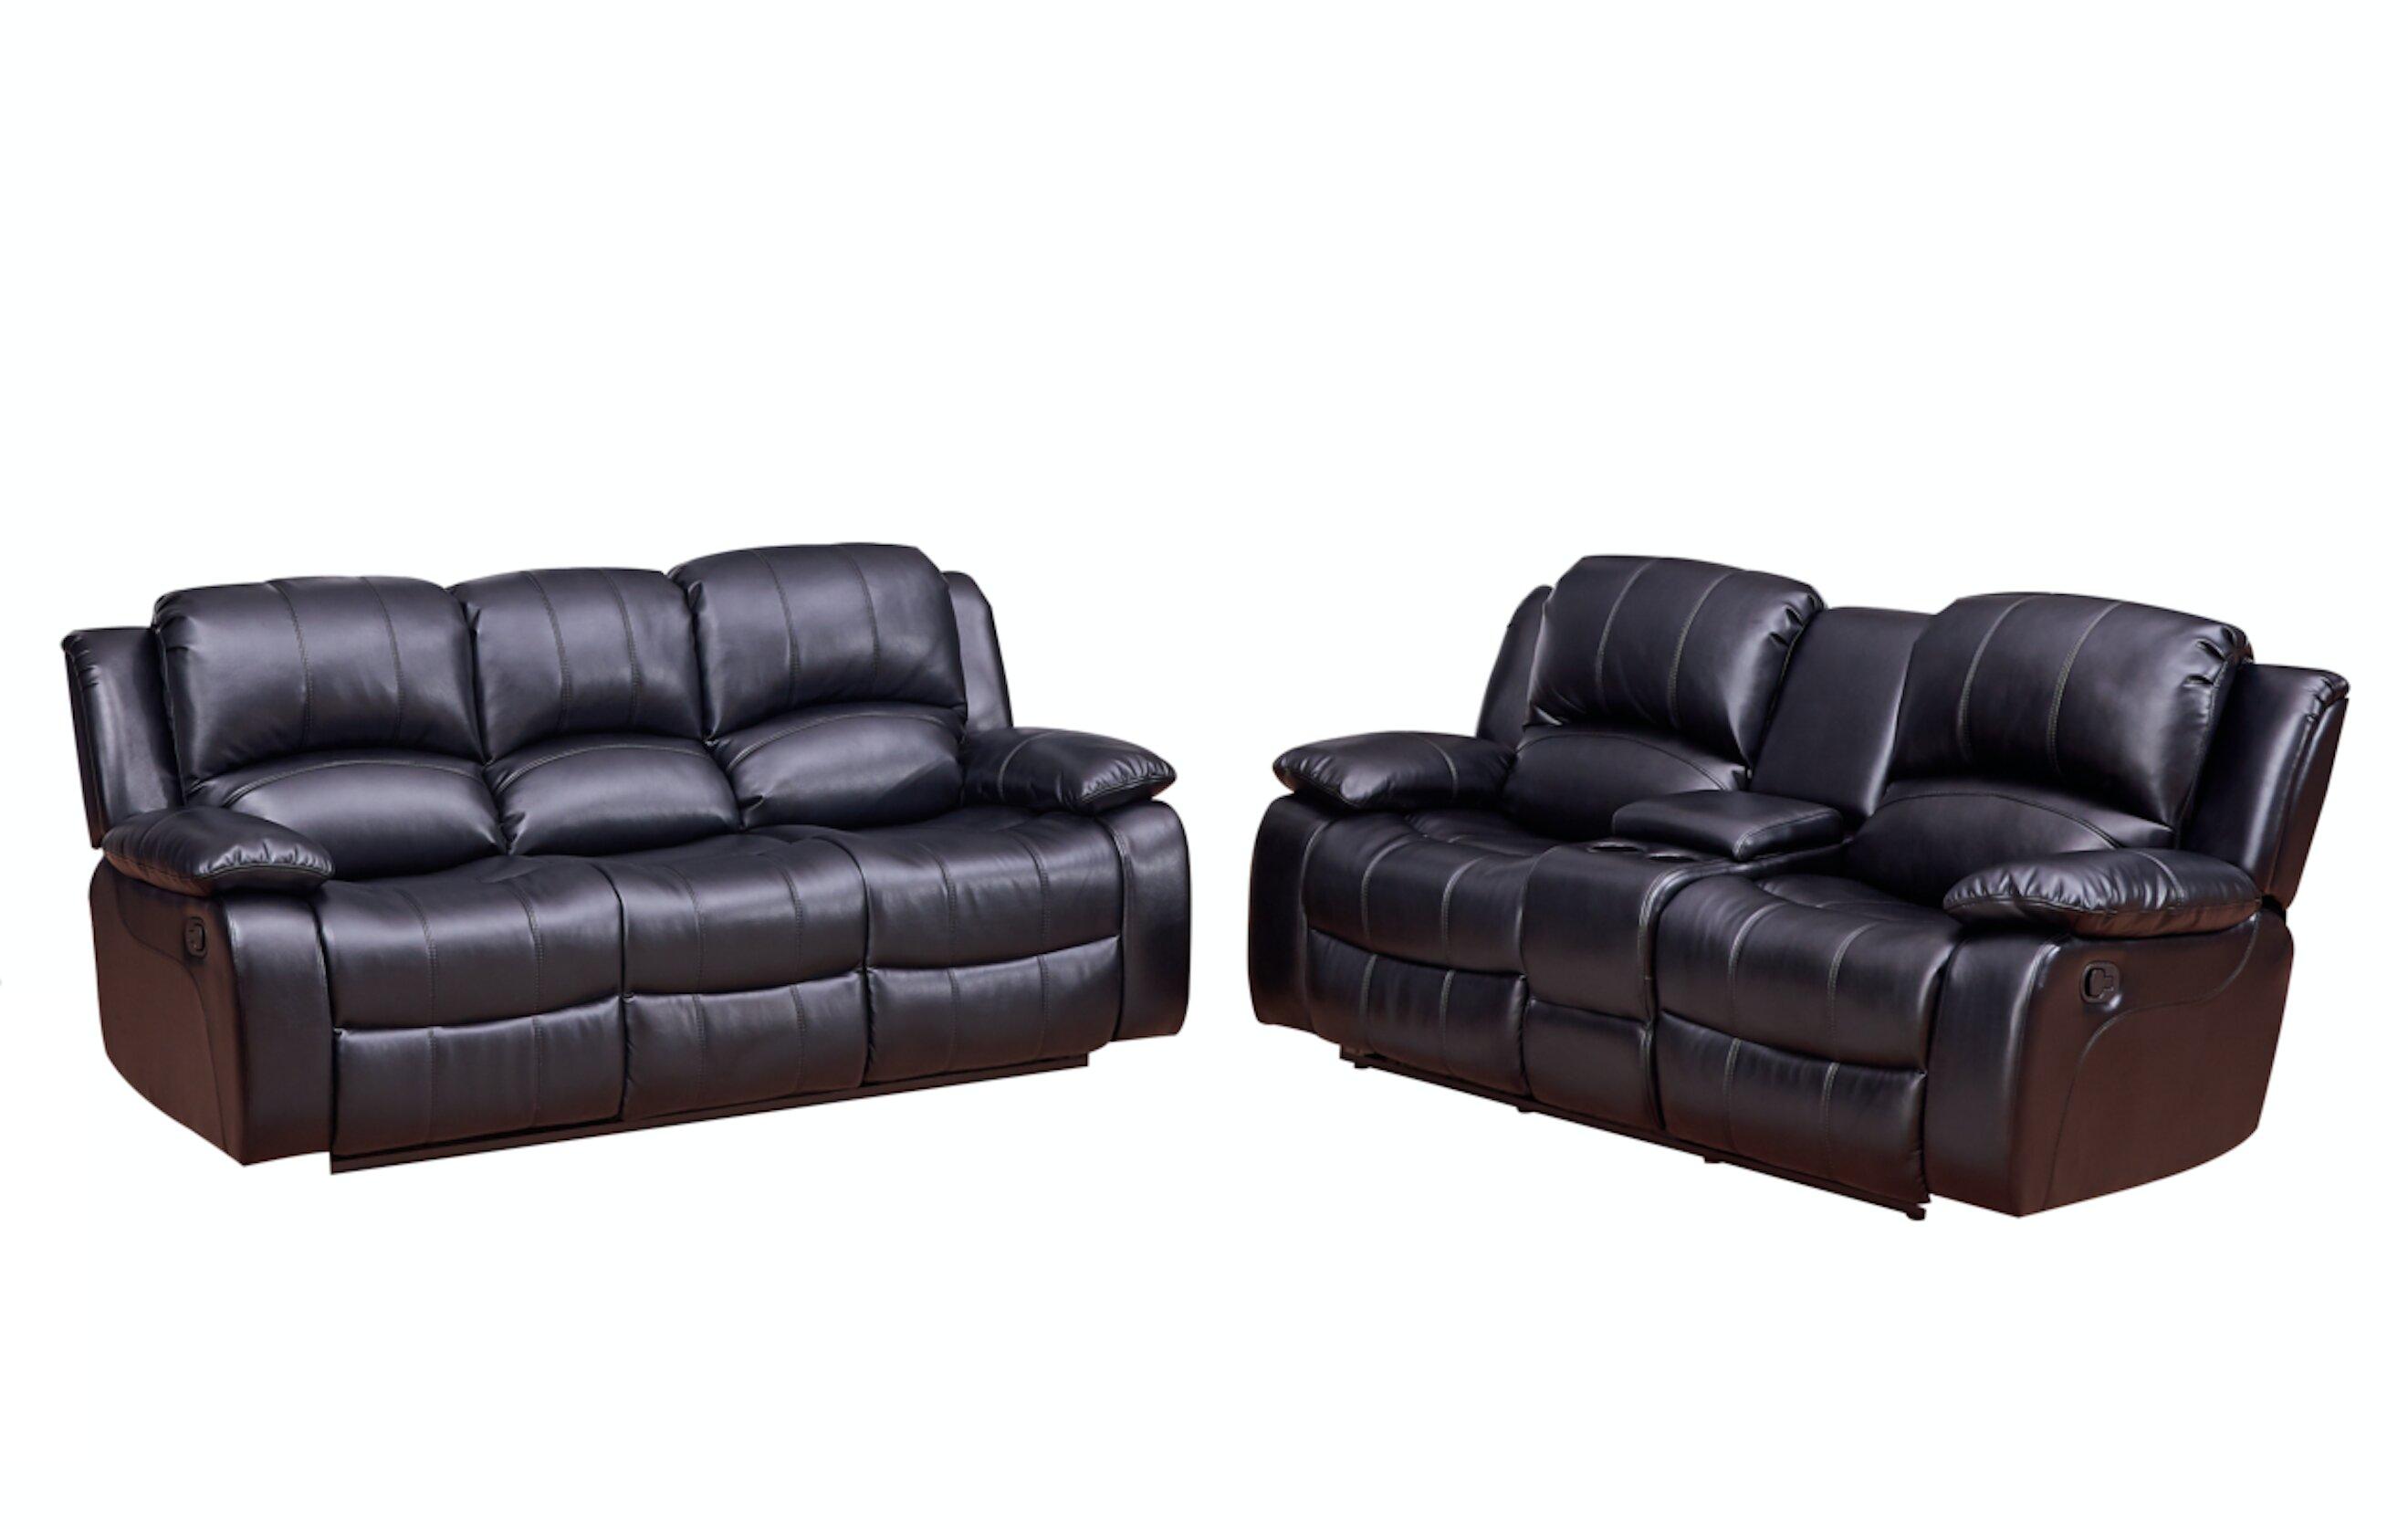 Red Barrel Studio Wooding 2 Piece Reclining Living Room Set | Wayfair